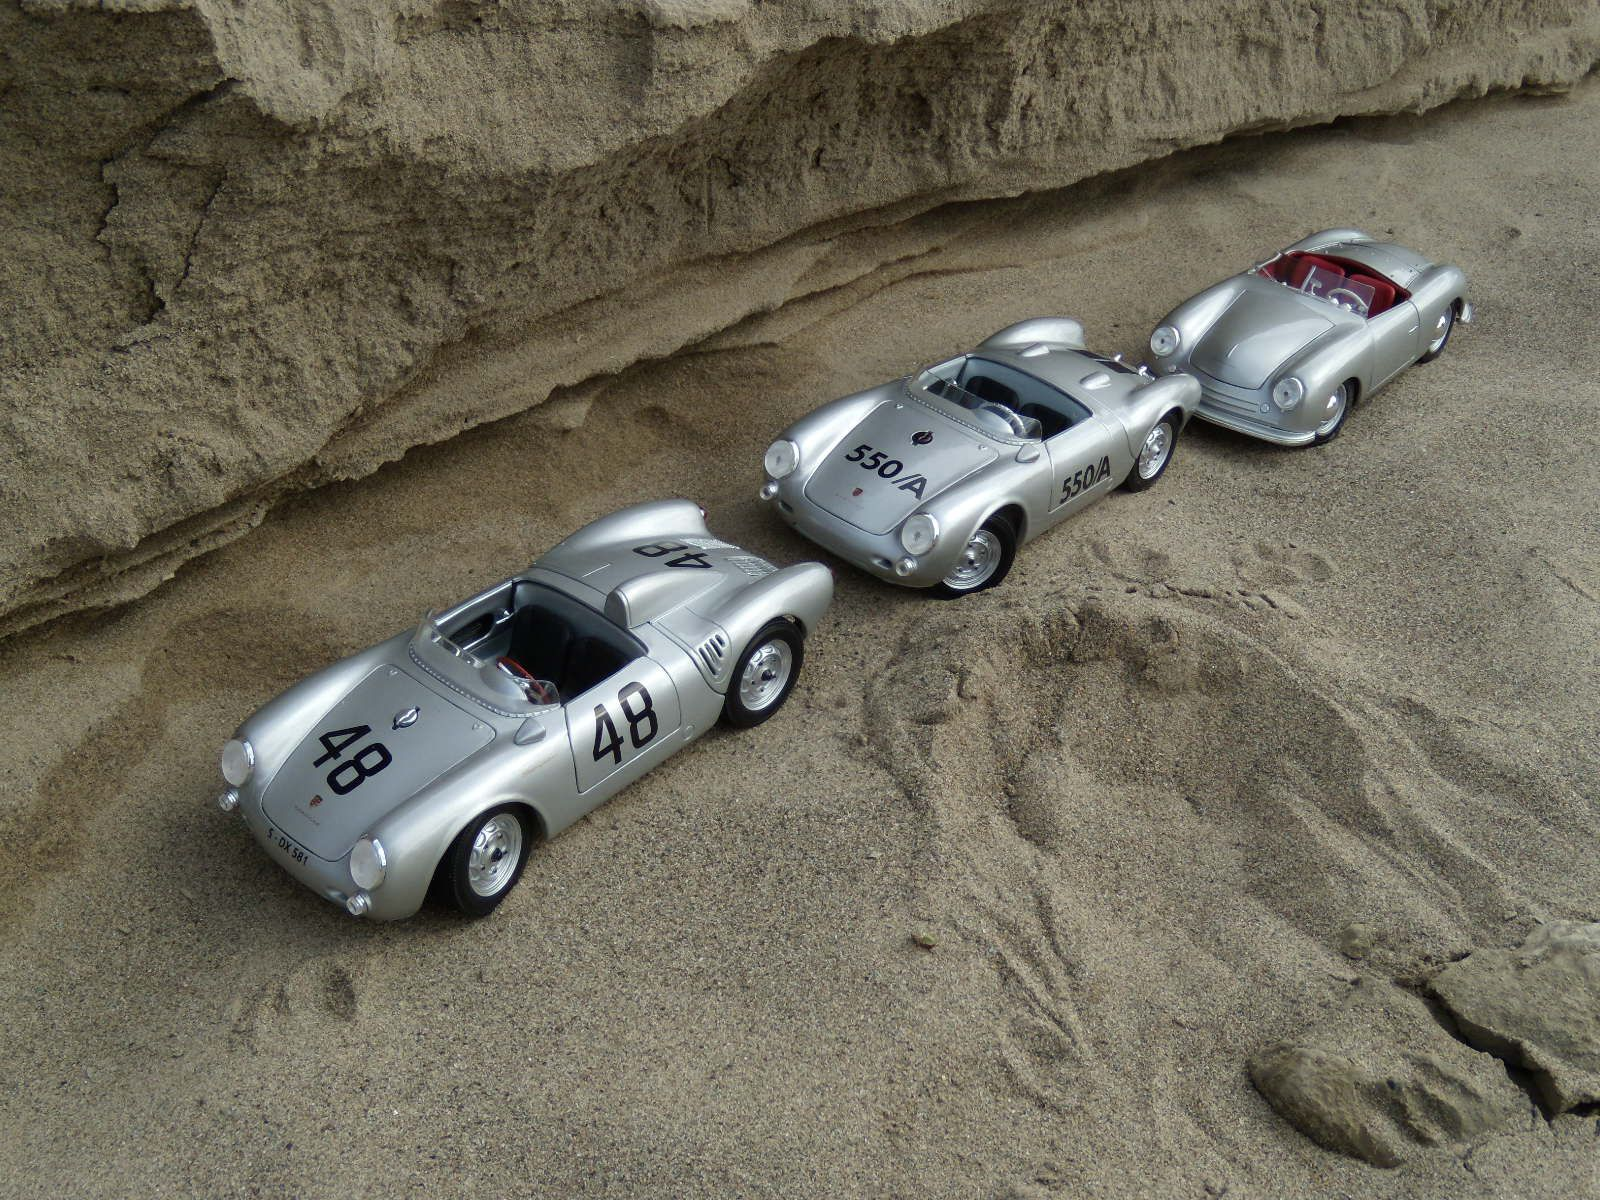 931a98c579e747c9b15648f004d8588e Outstanding Maisto Porsche 911 Gt1 Le Mans 1998 Cars Trend